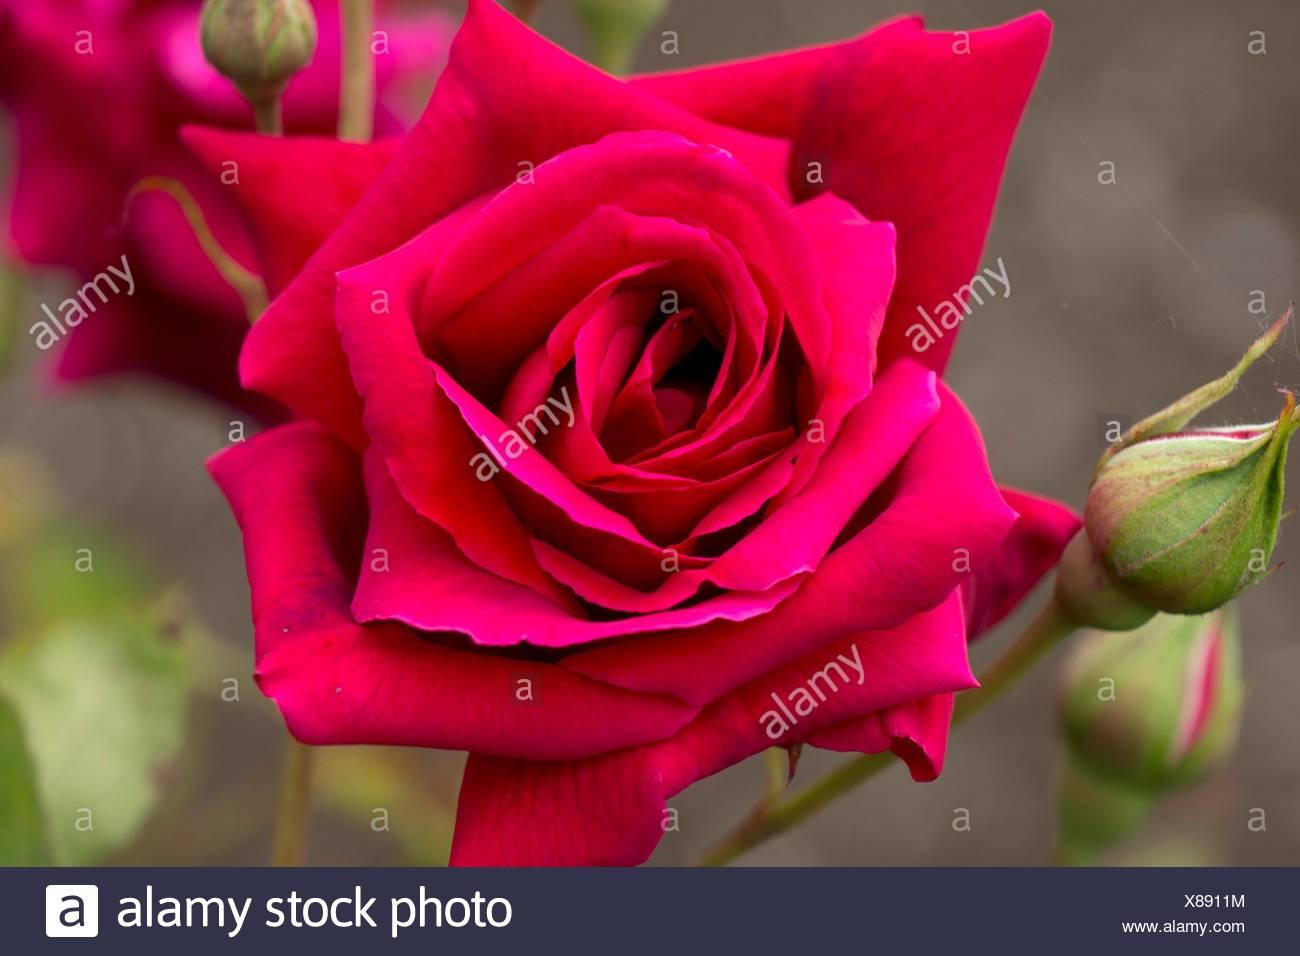 Crimson Glory rose, Heirloom Roses, St Paul, Oregon. - Stock Image